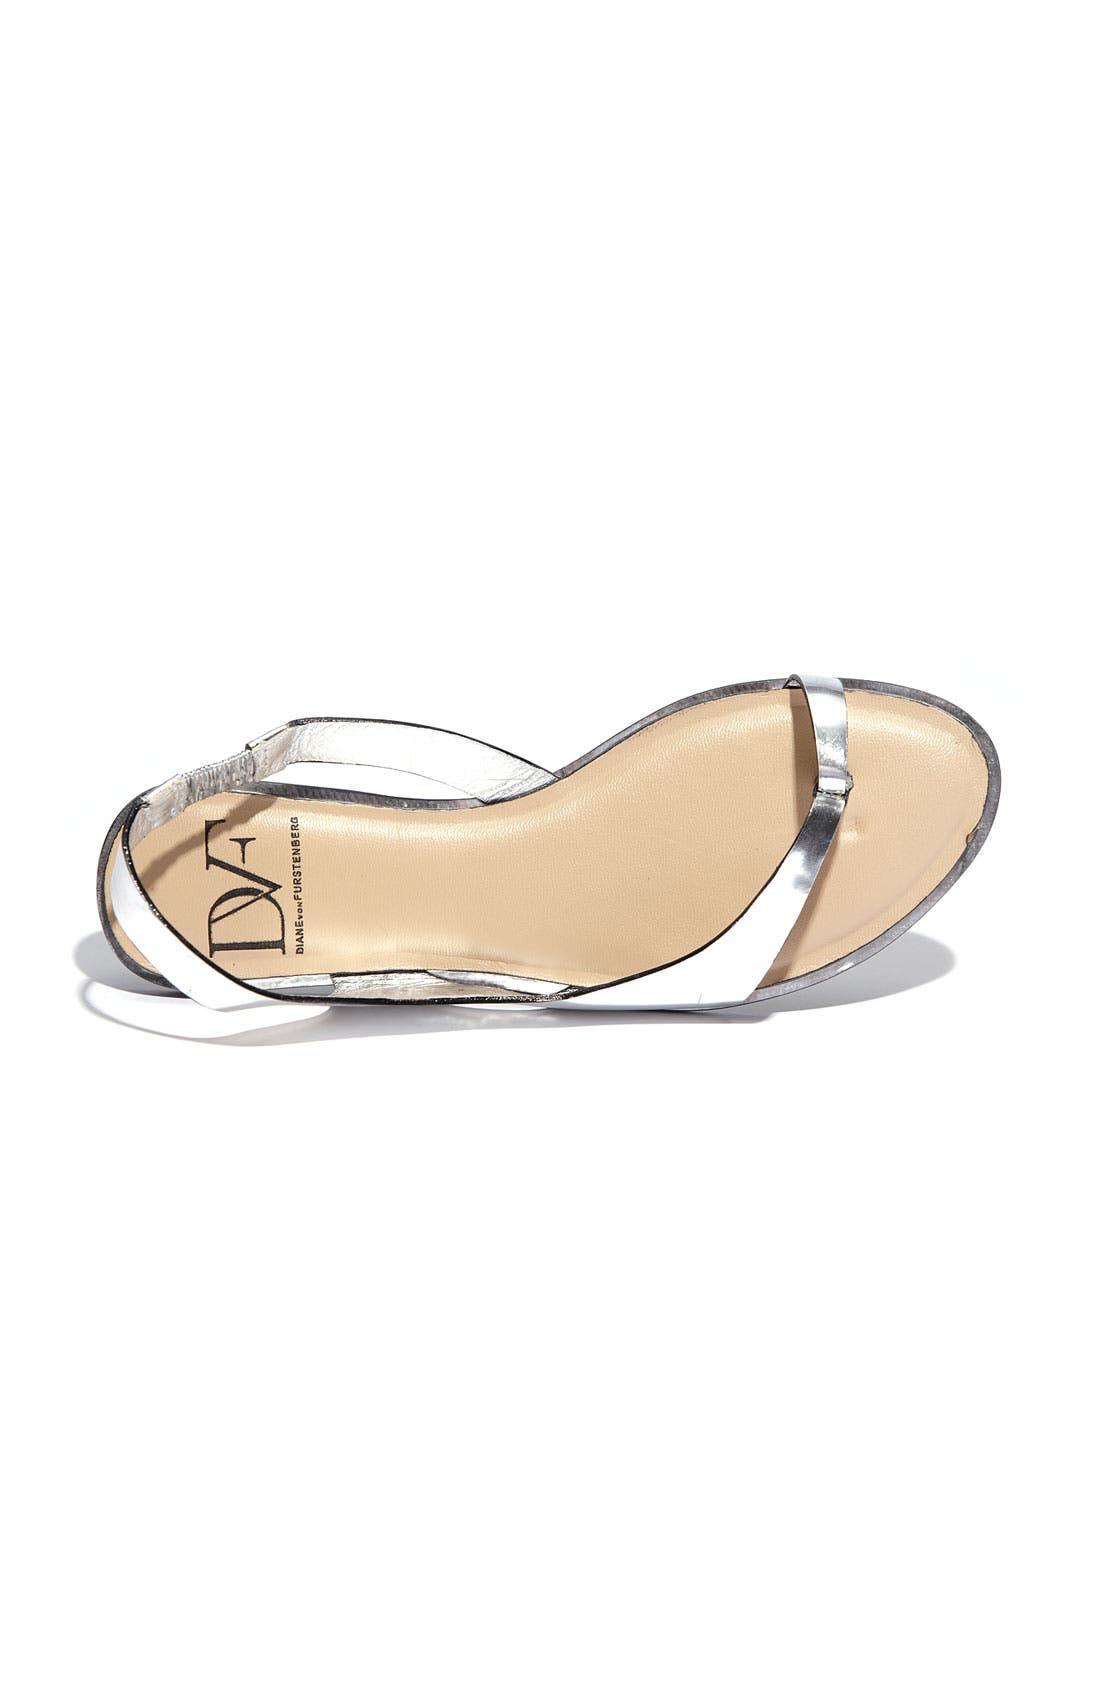 Alternate Image 3  - Diane von Furstenberg 'Kaiti' Slingback Sandal